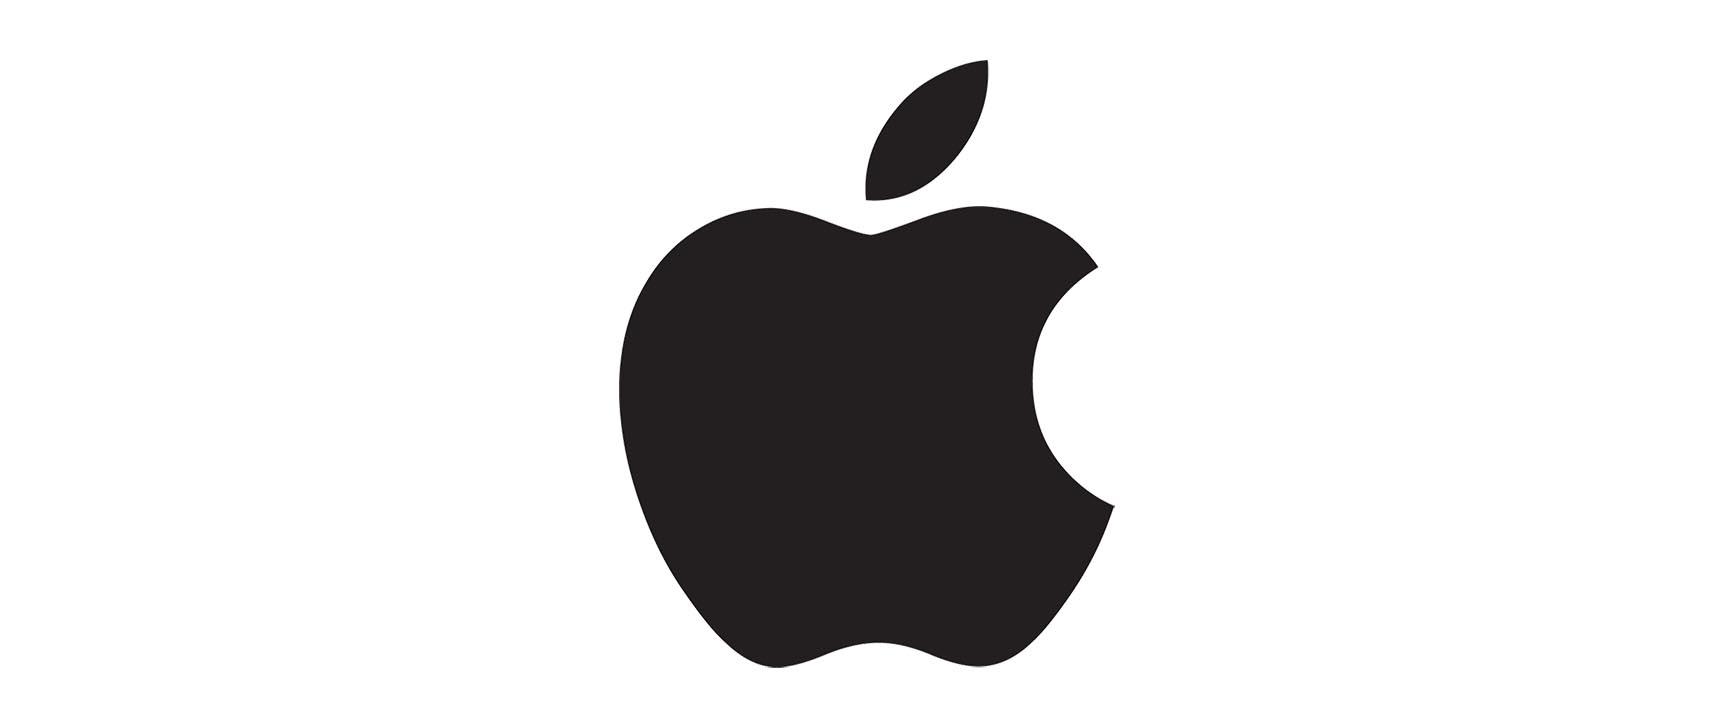 2 Apple.jpg